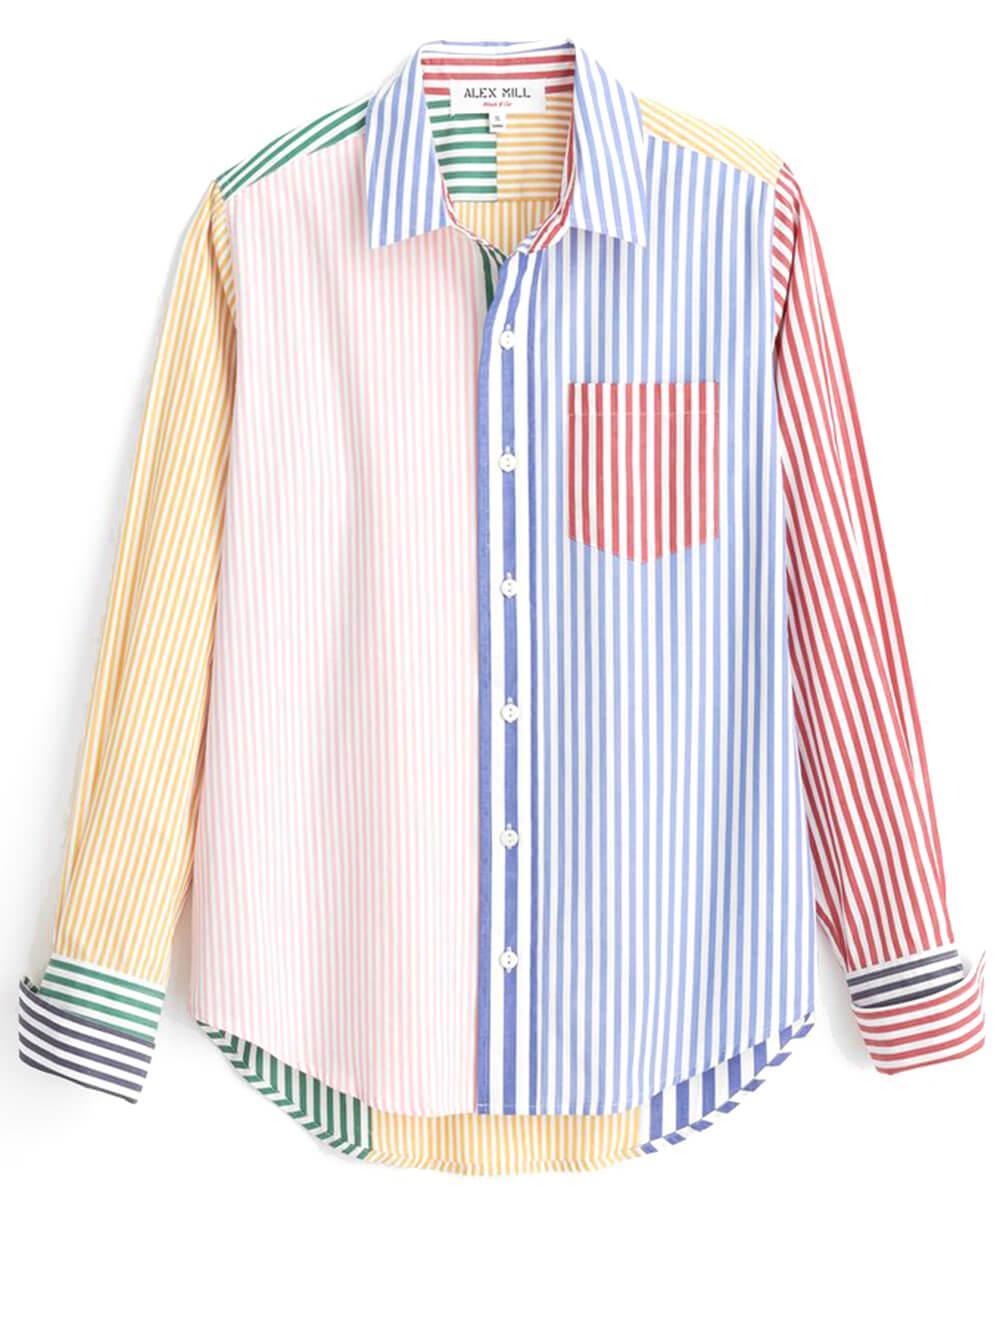 Mixed Stripe Whatt Shirt Item # 212-WS034-2690